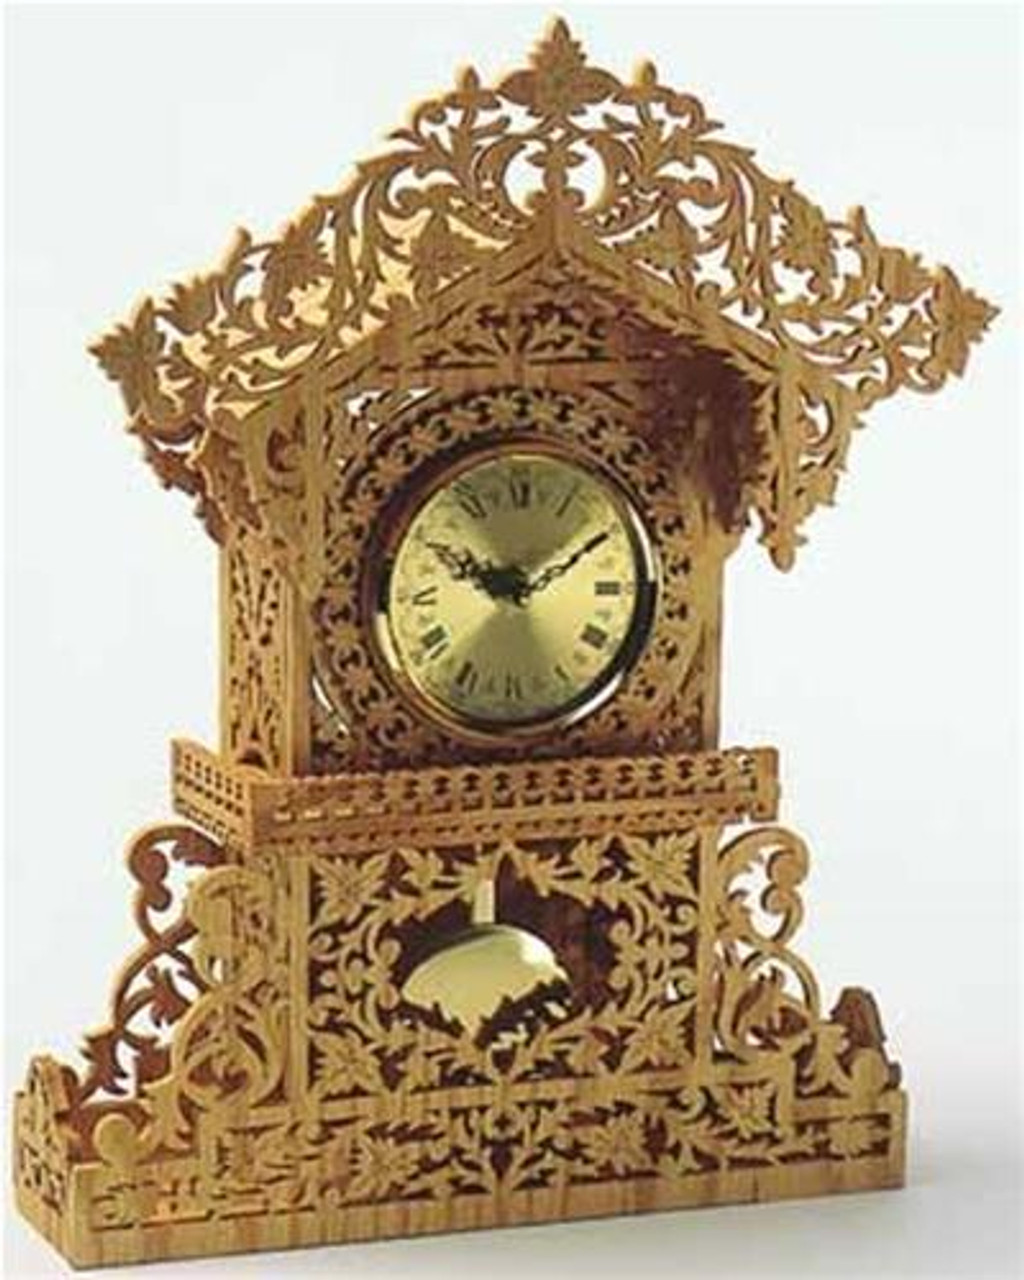 Wildwood Designs Queens Clock Scroll Saw Plan